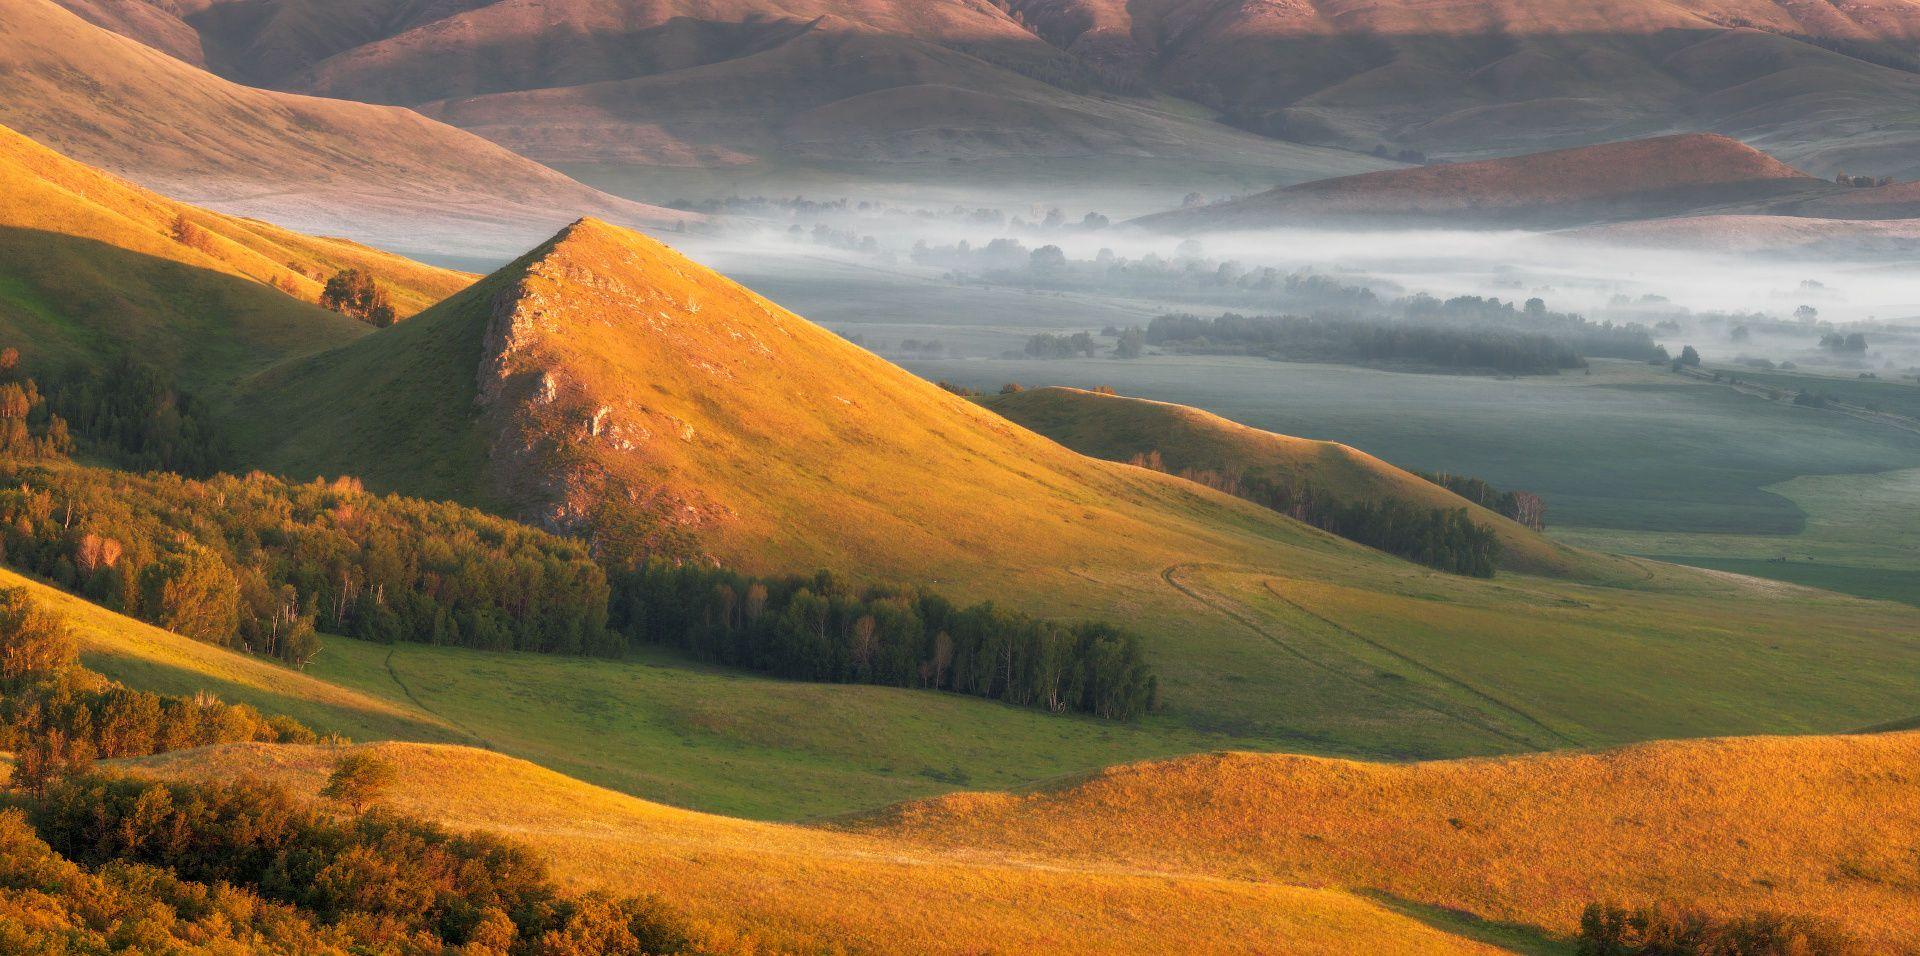 Misty dawn in the Southern Urals by Marat Akhmetvaleev on 500px